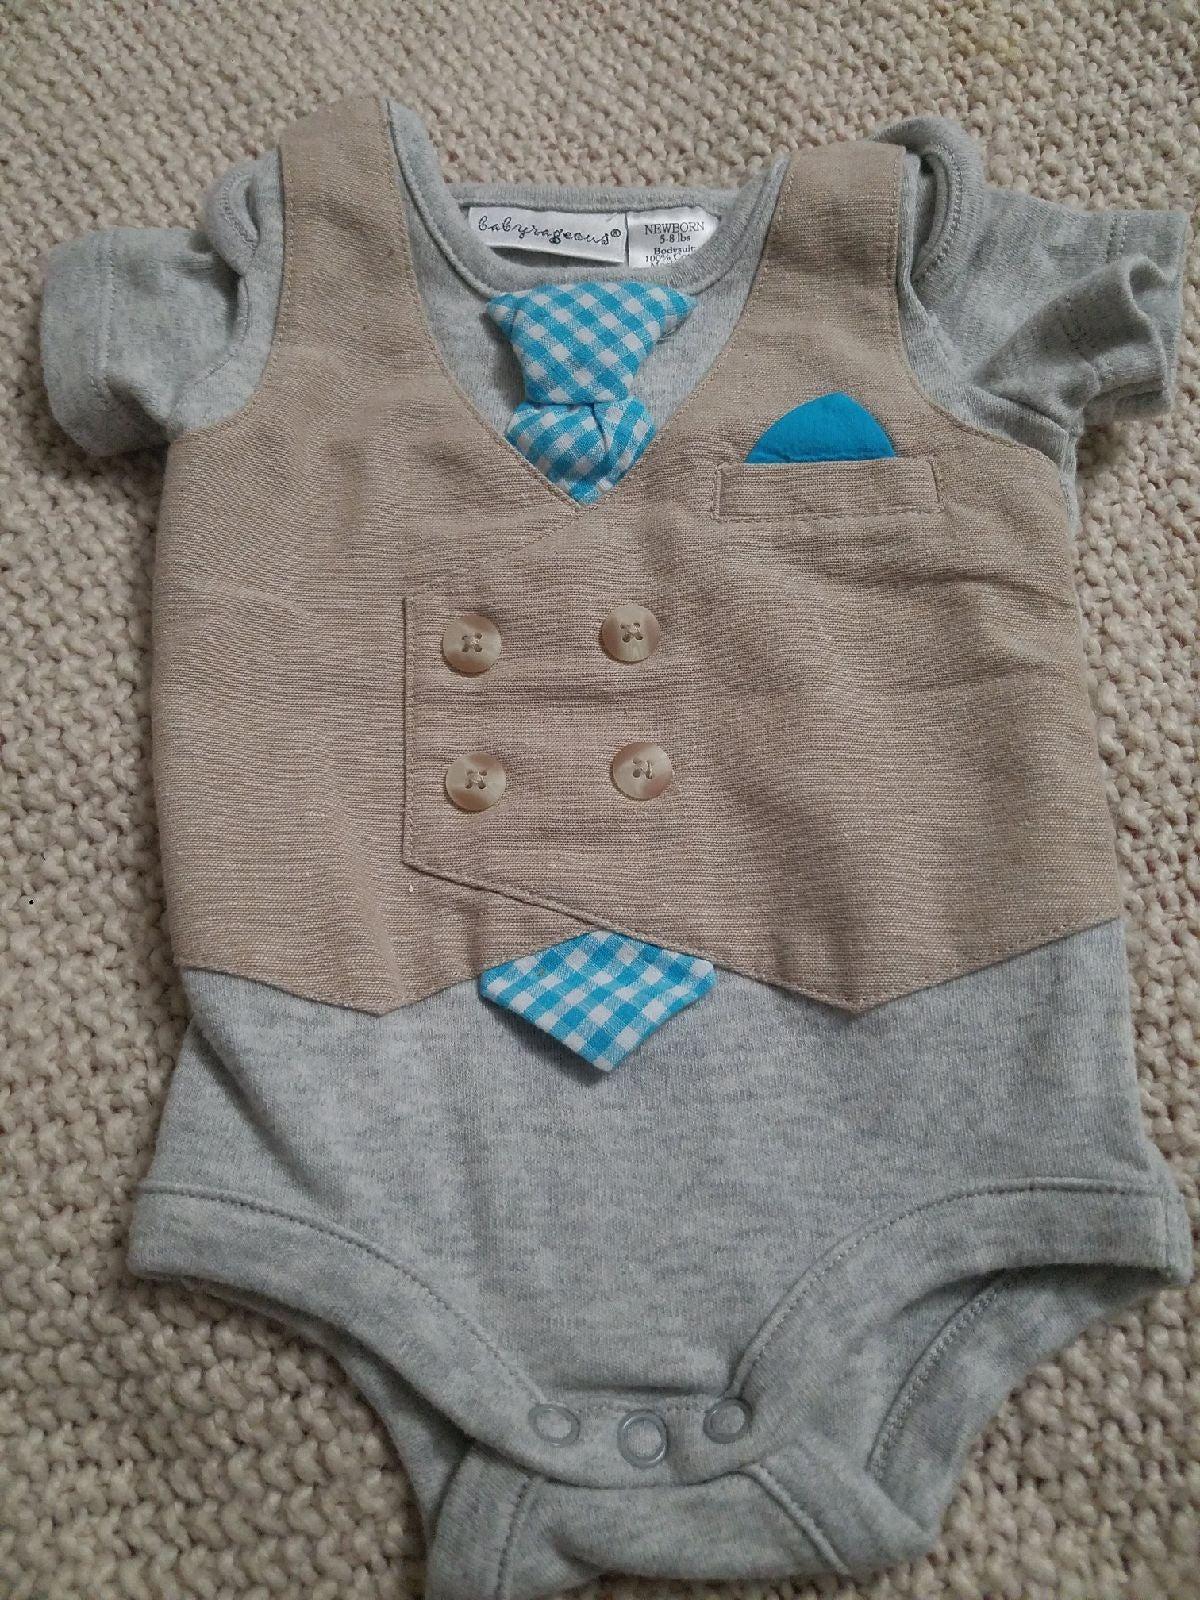 #710 Babyrageous Newborn Tie Prep Formal